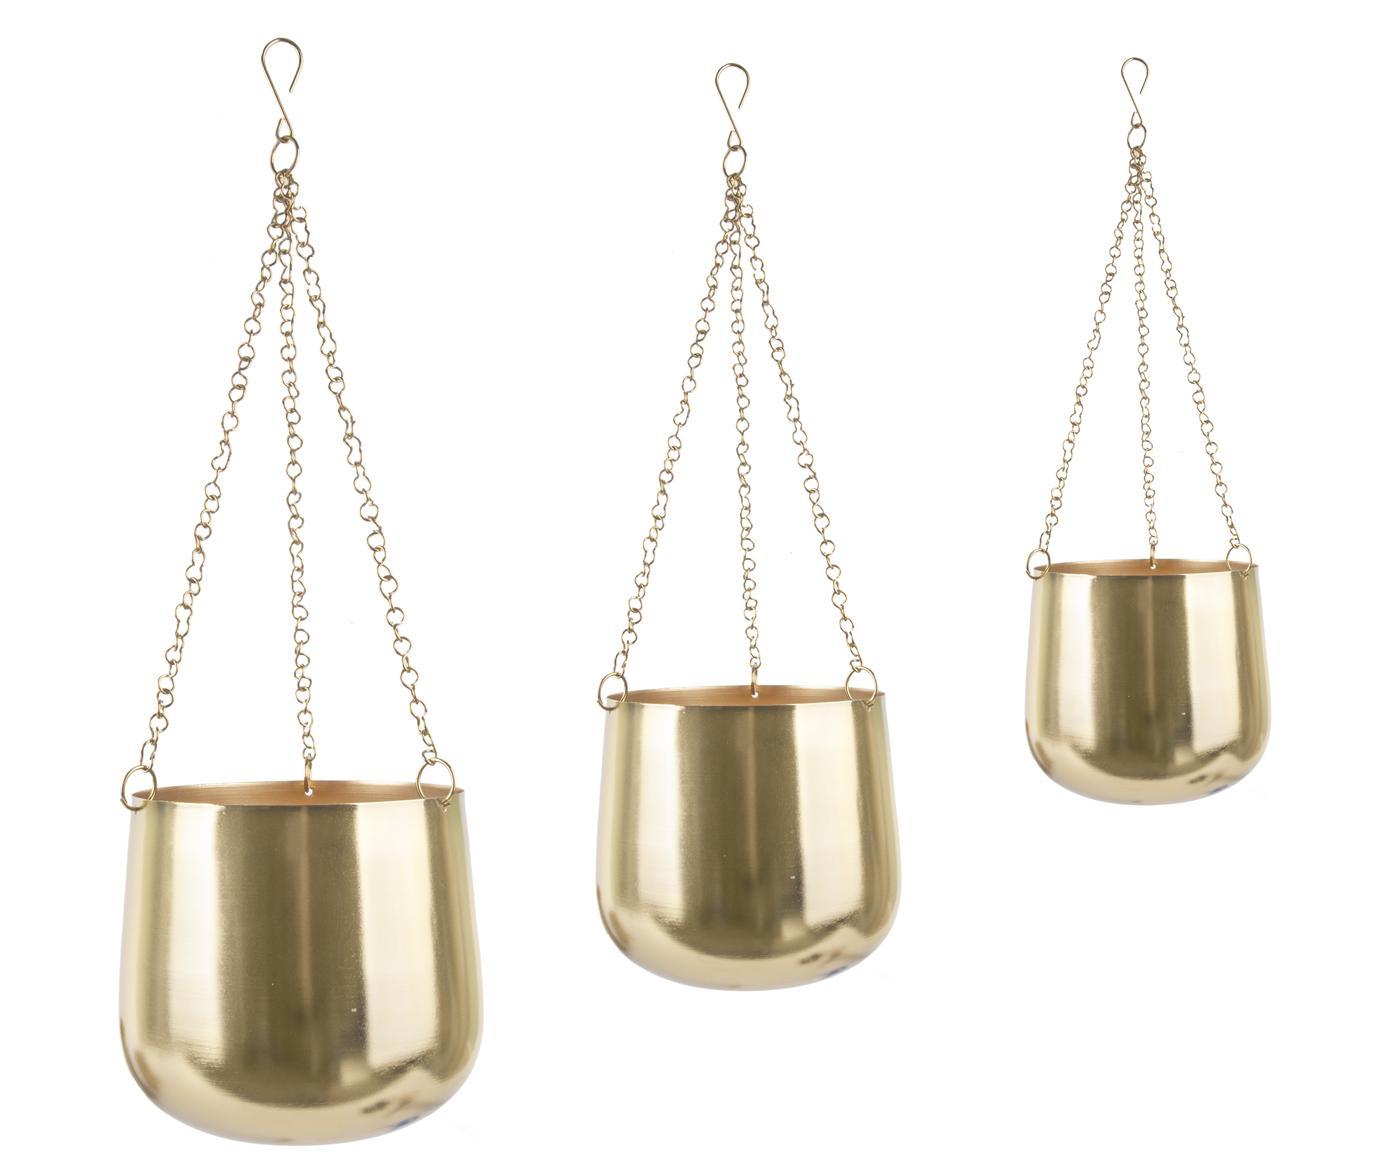 Set de cestos colgantes Cask, 3pzas., Metal pintado, Dorado, Tamaños diferentes